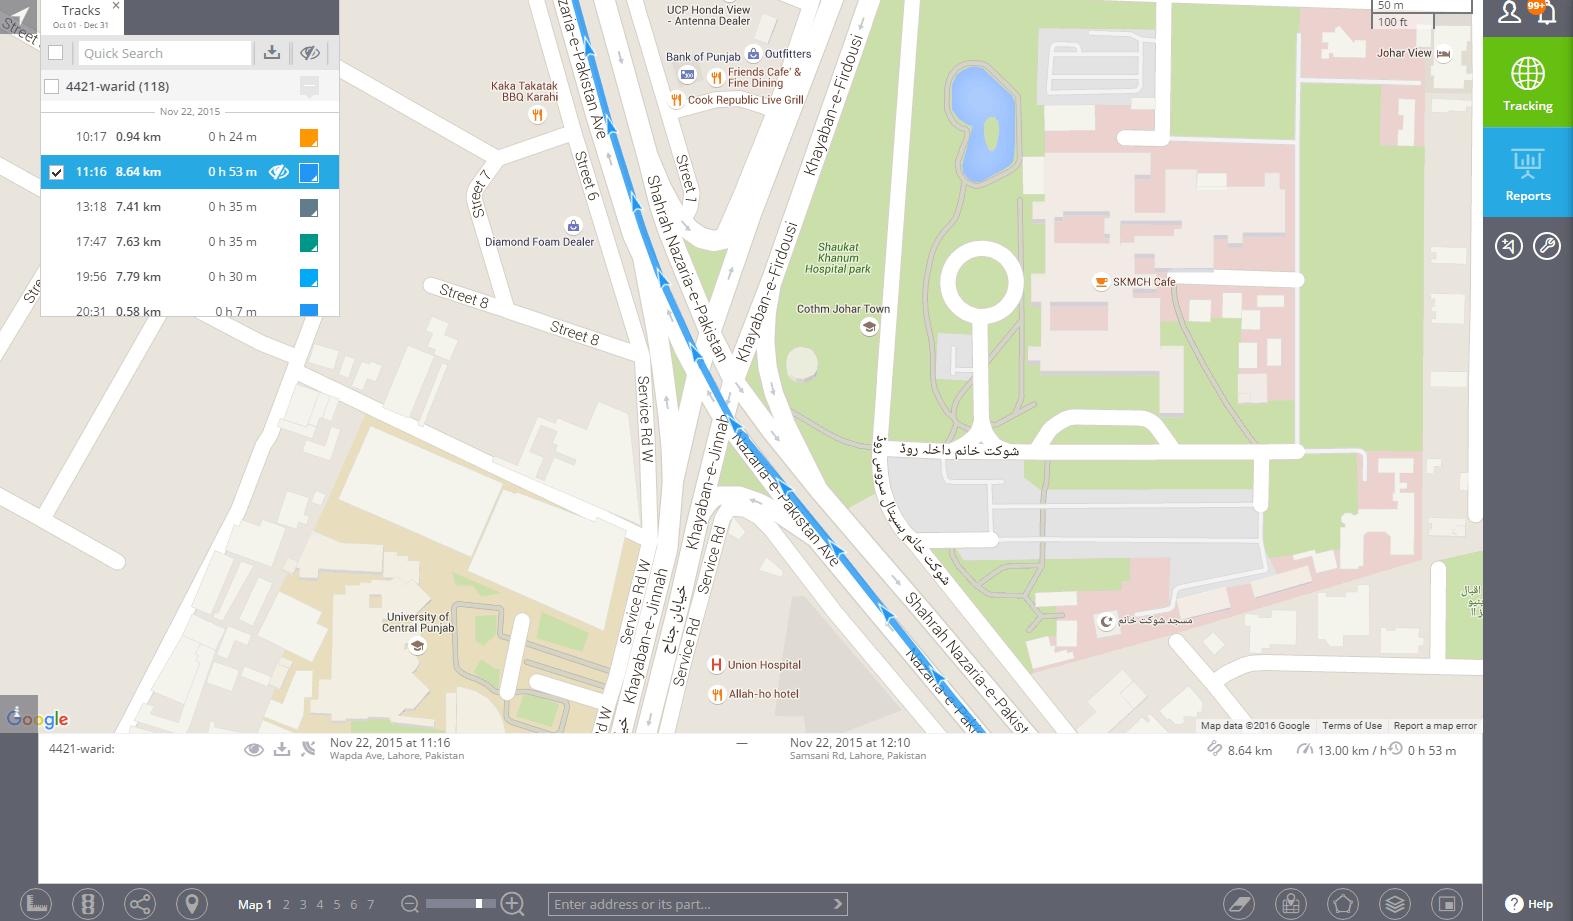 GPS tracking quality